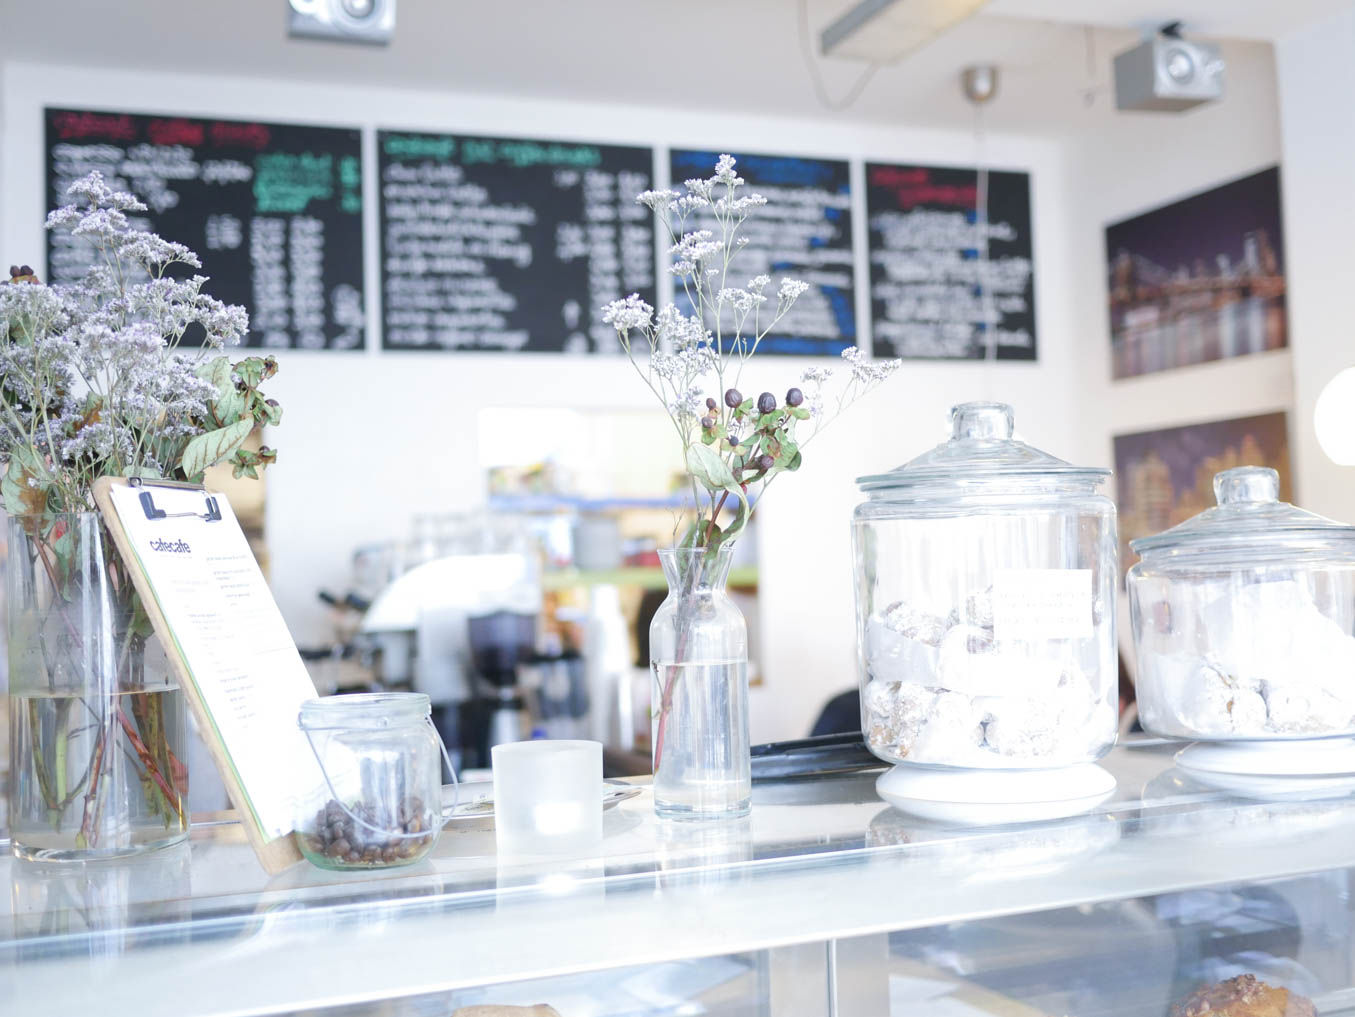 Café Köln Ehrenfeld: Café Café